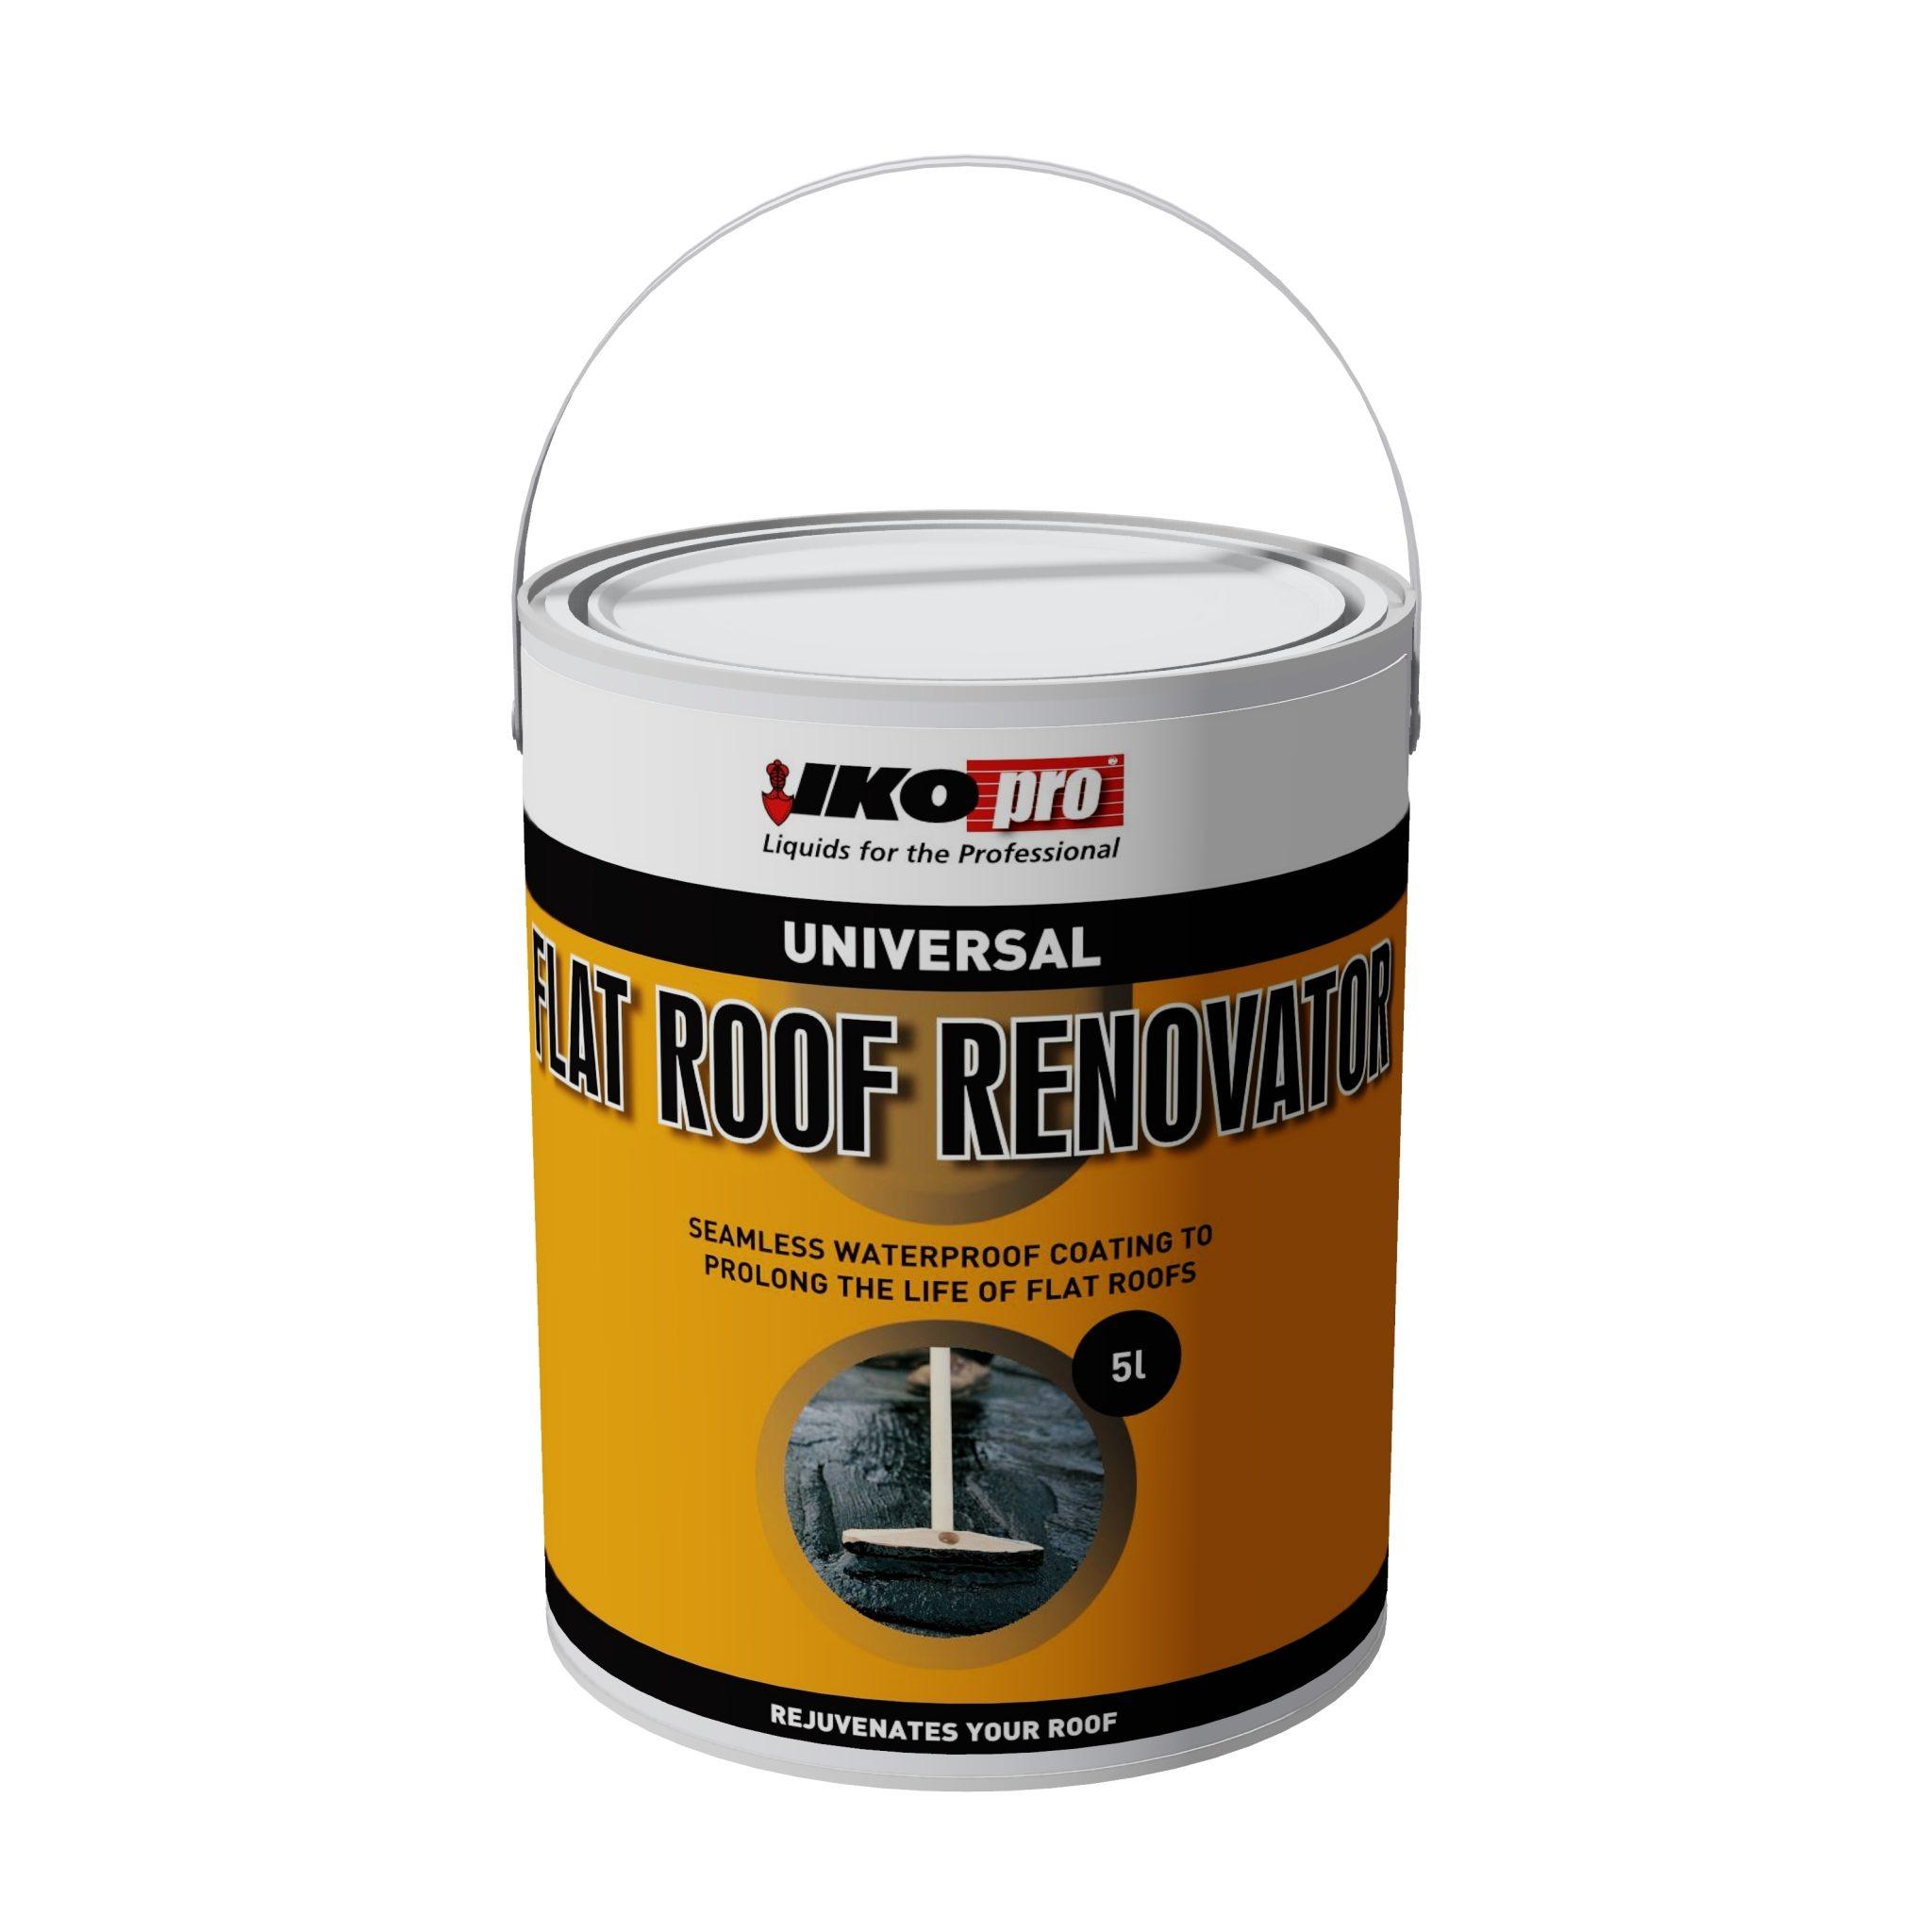 Iko-Pro Flat Roof Renovator 5Ltr